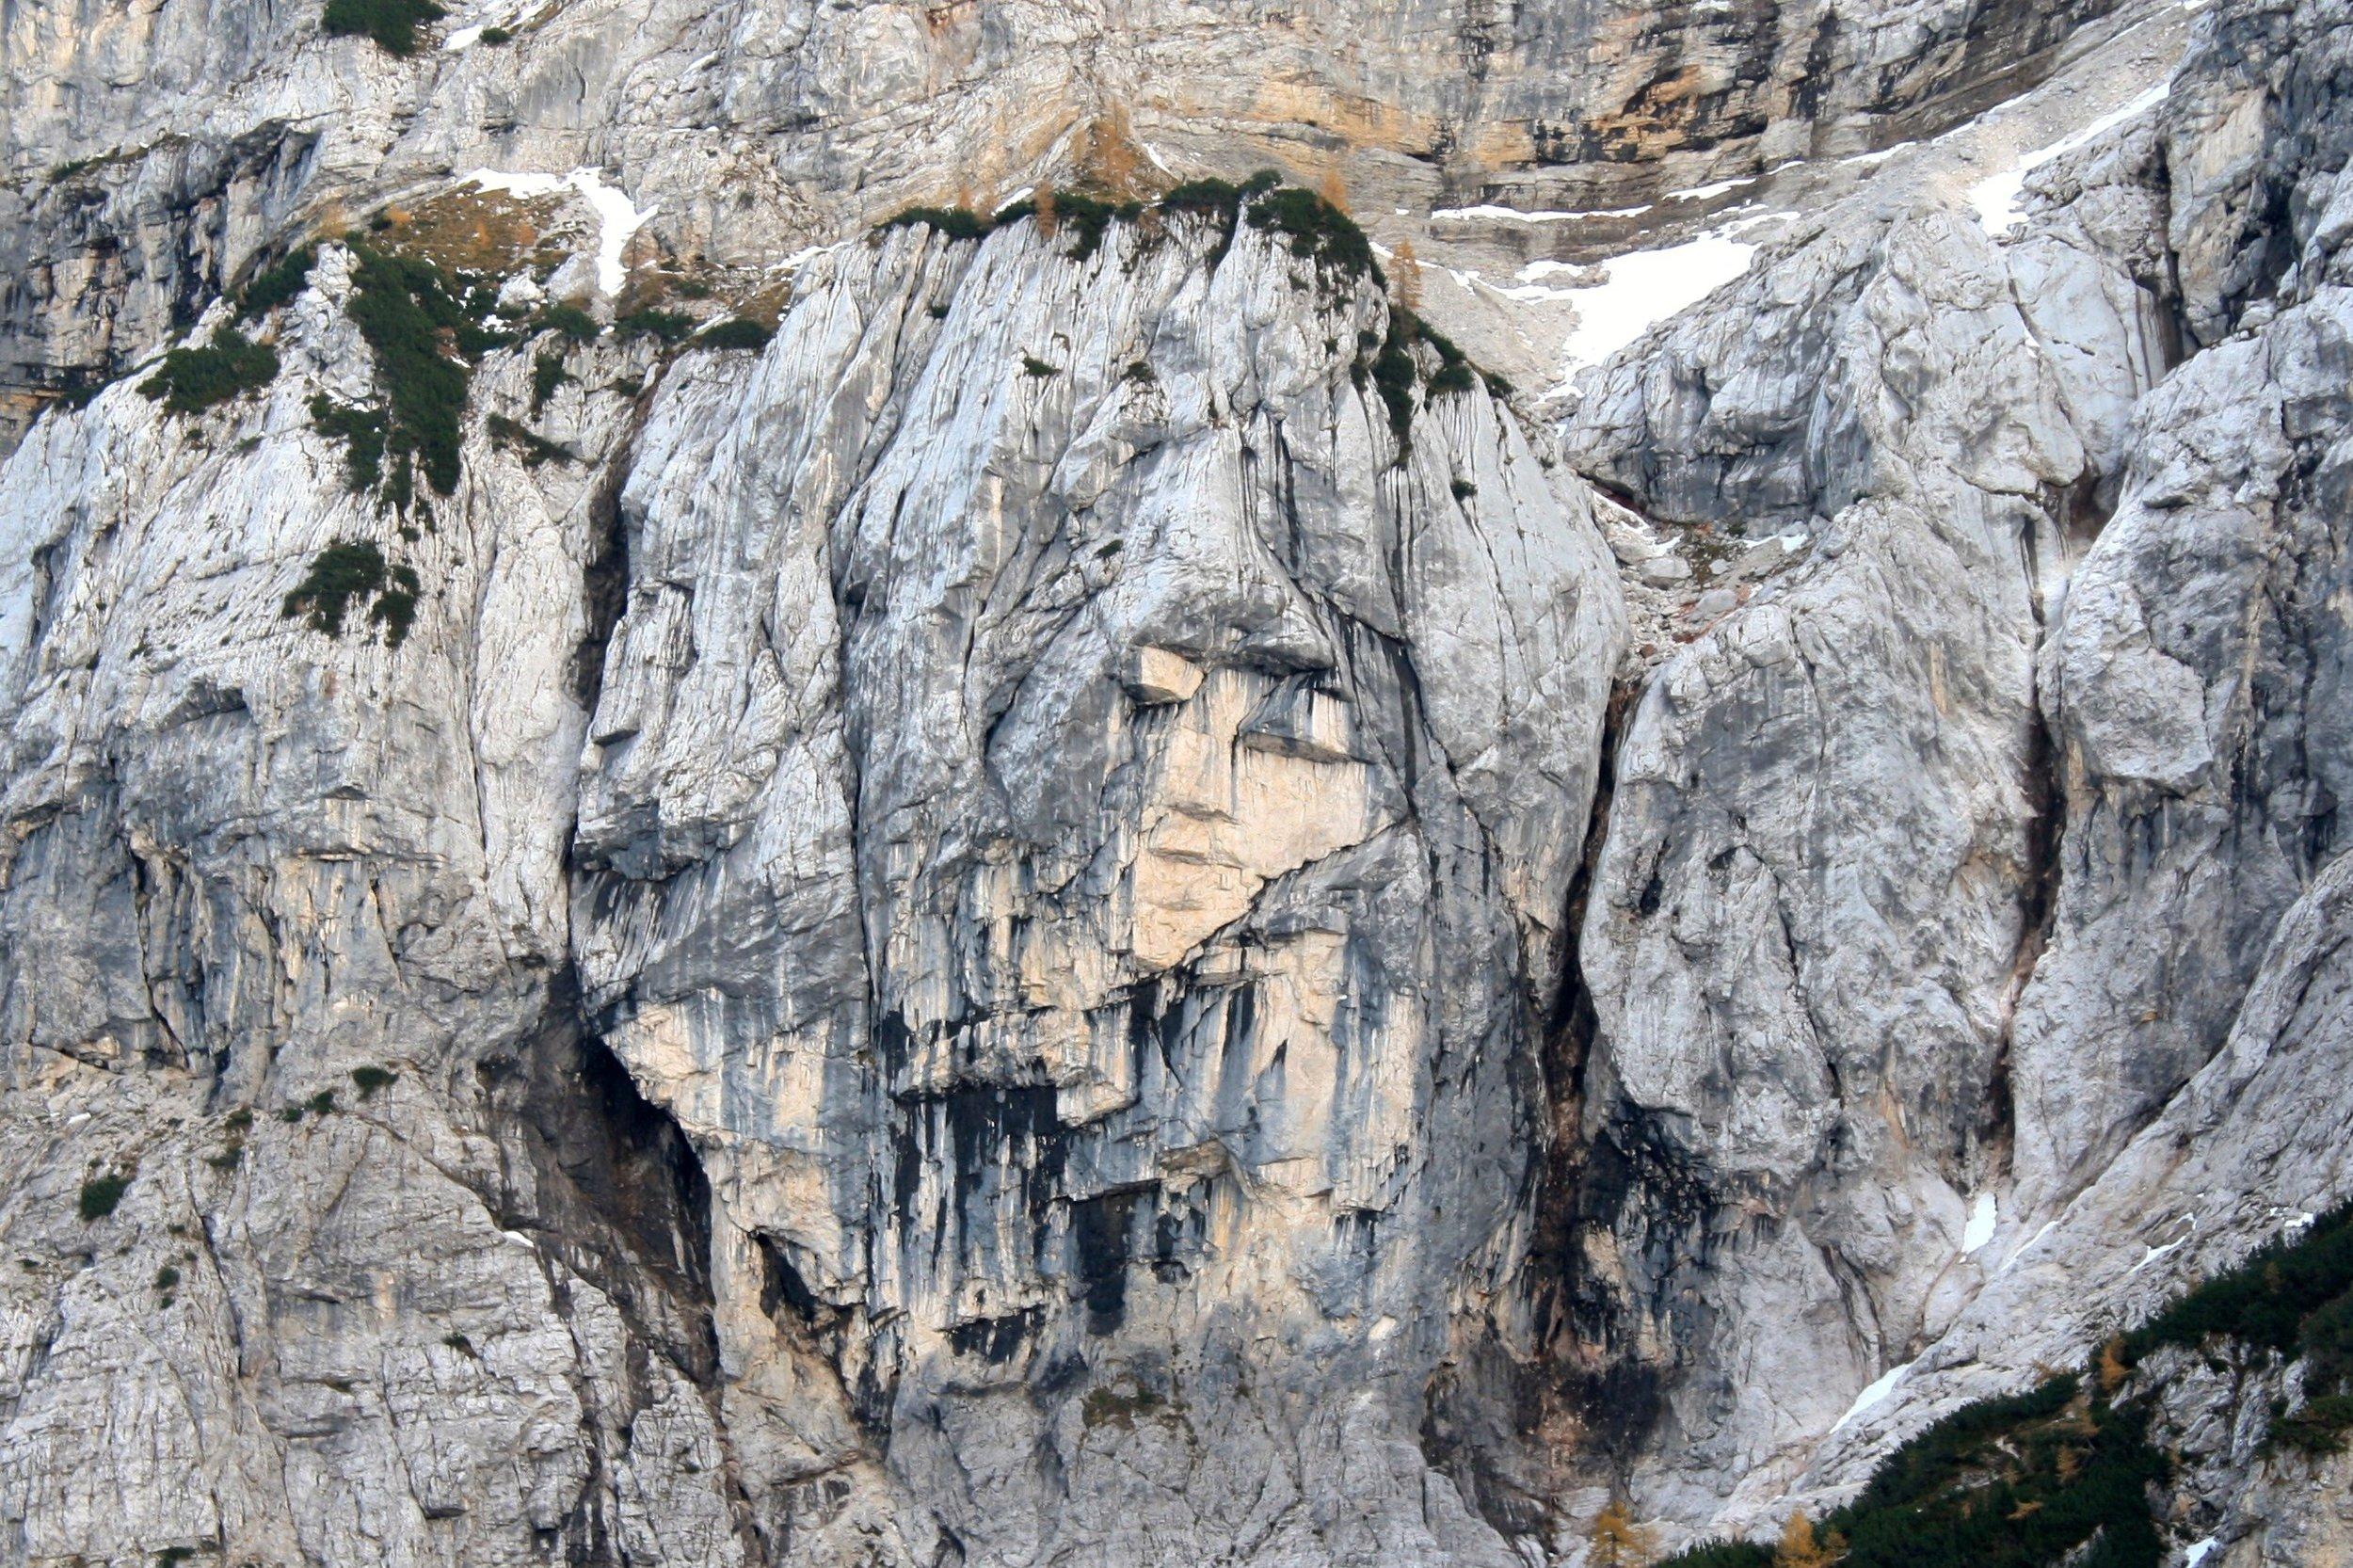 The Heathen Maiden, a rock formation near Kranjska Gora, in the Julian Alps of Slovenia